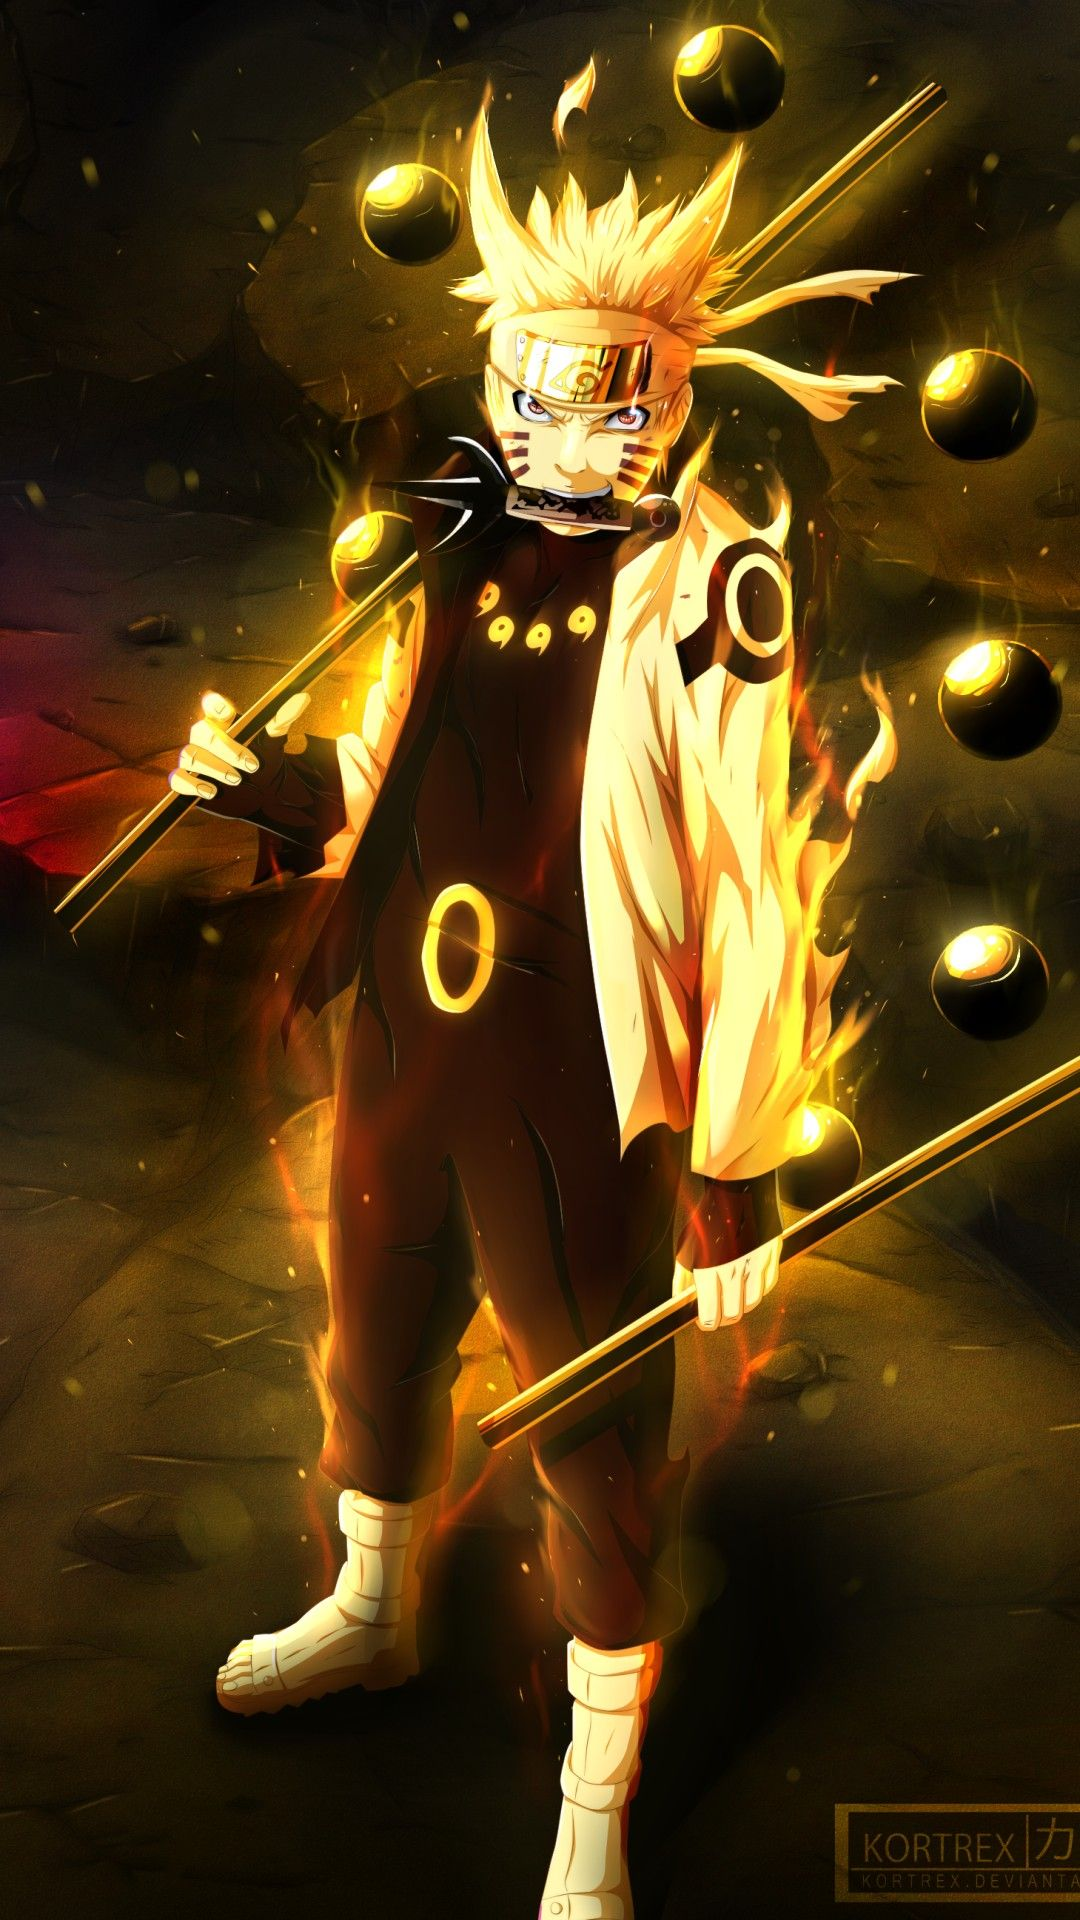 Wallpaper Phone Naruto Full Hd Naruto E Sasuke Desenho Animes